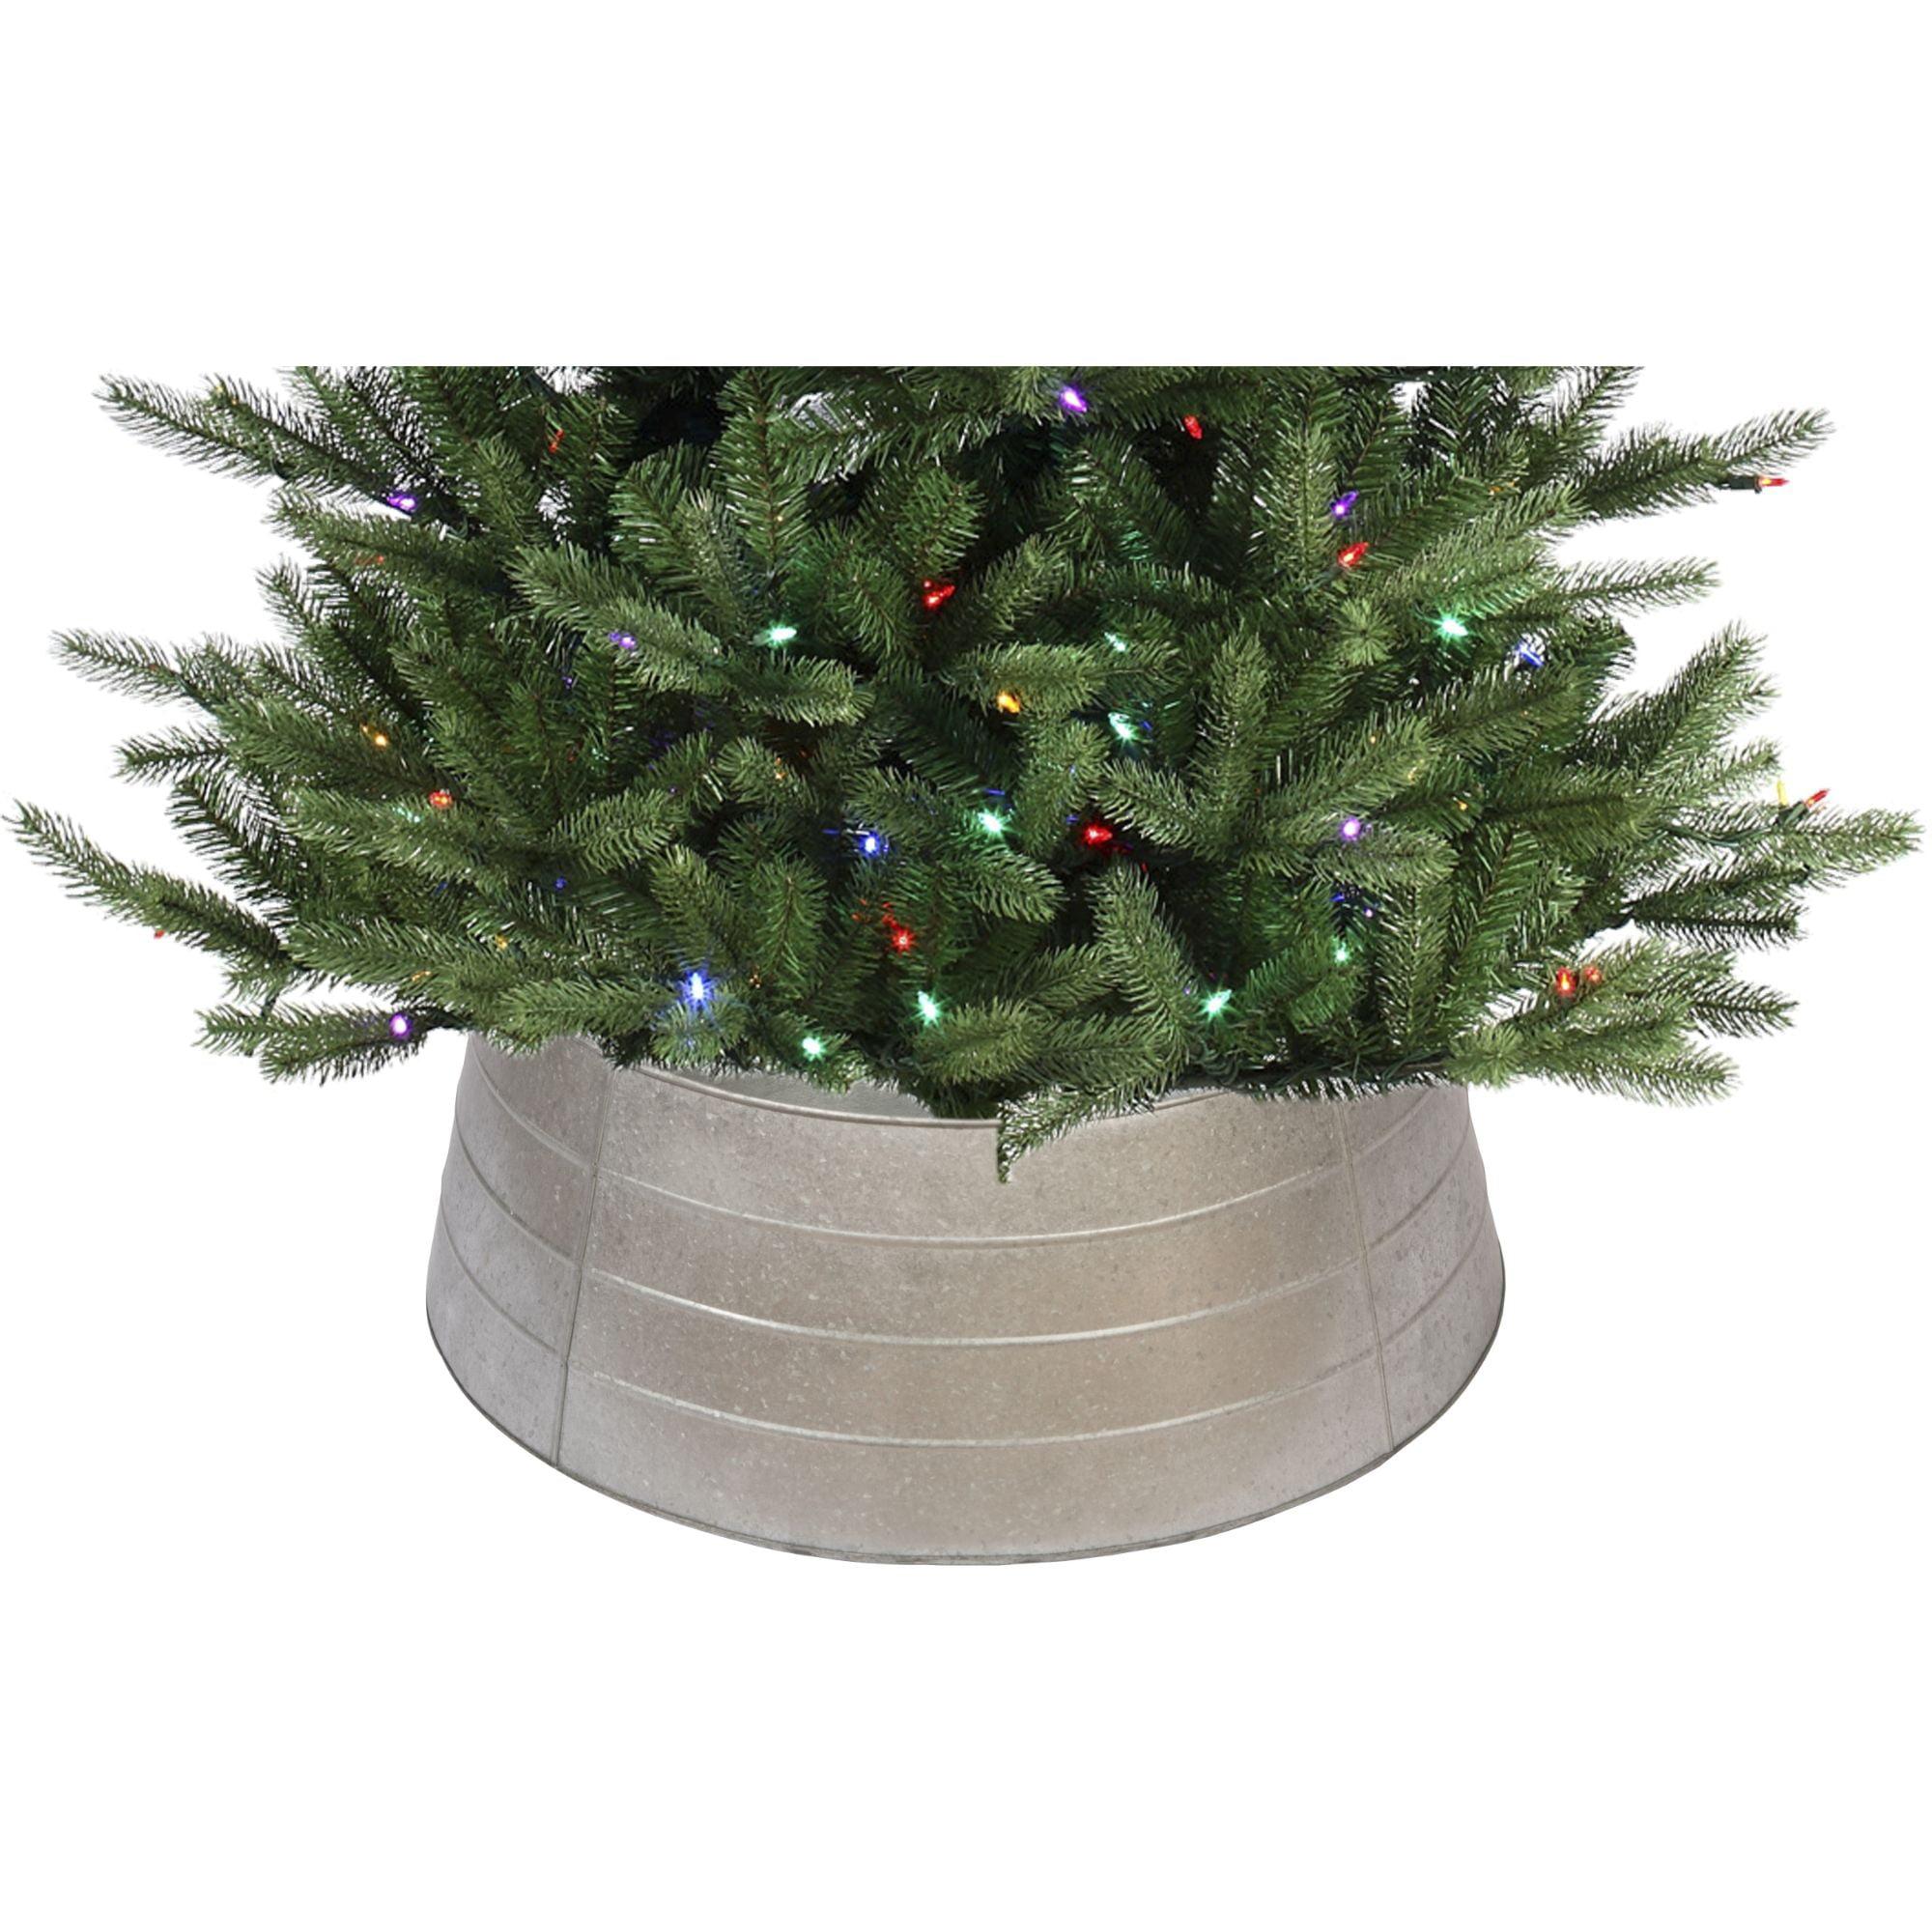 28 Silver Rustic Christmas Galvanized Tree Collar Walmart Com Walmart Com